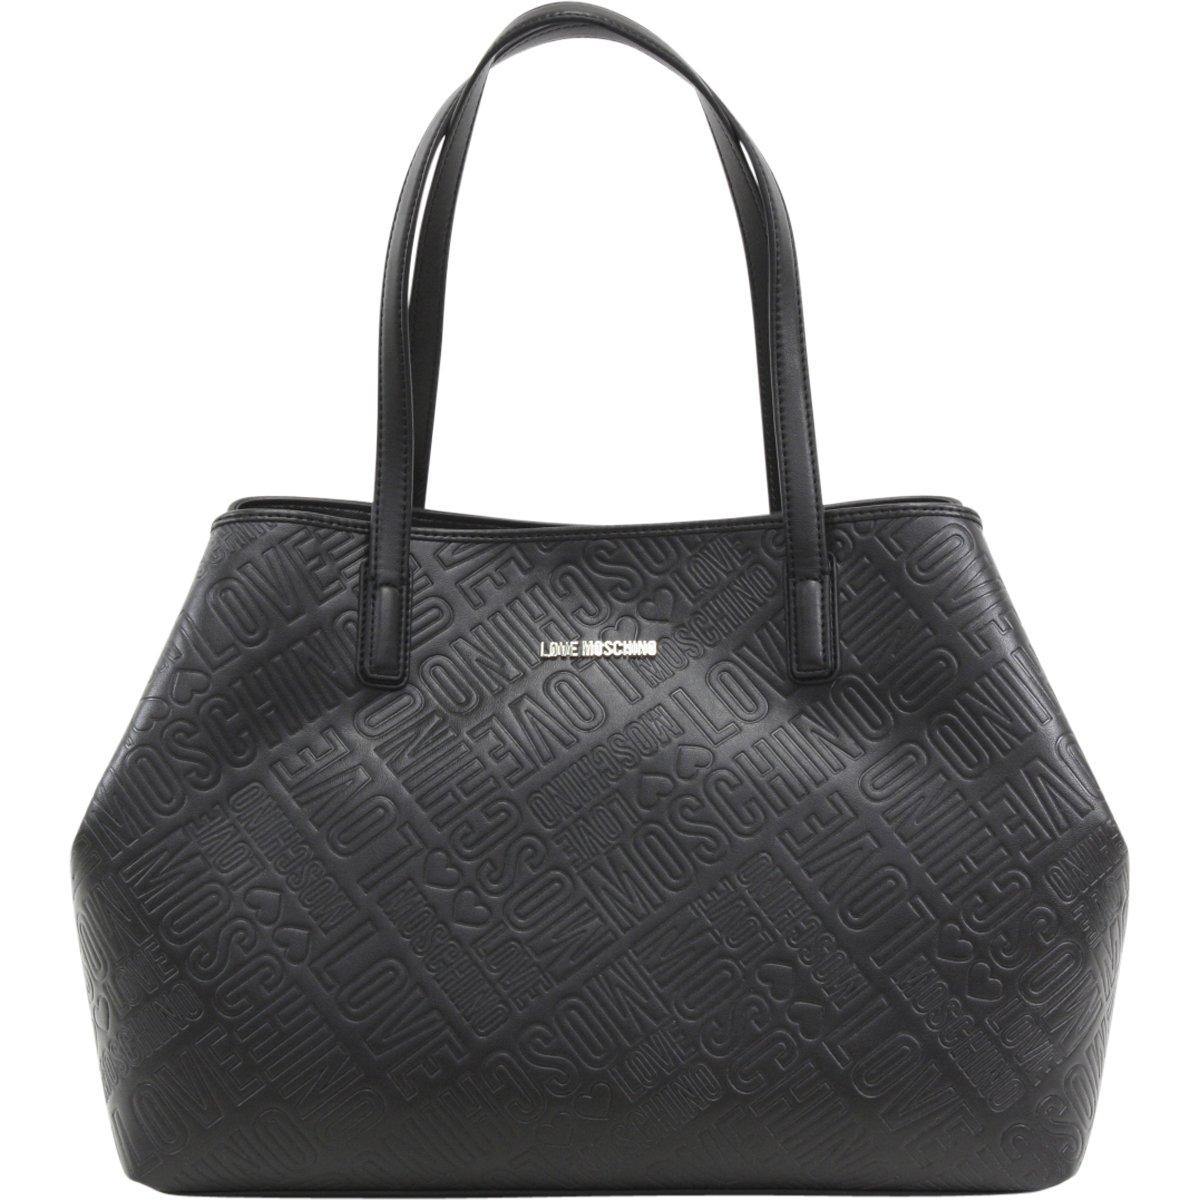 Love Moschino Women's Black Logo Embossed Satchel Handbag